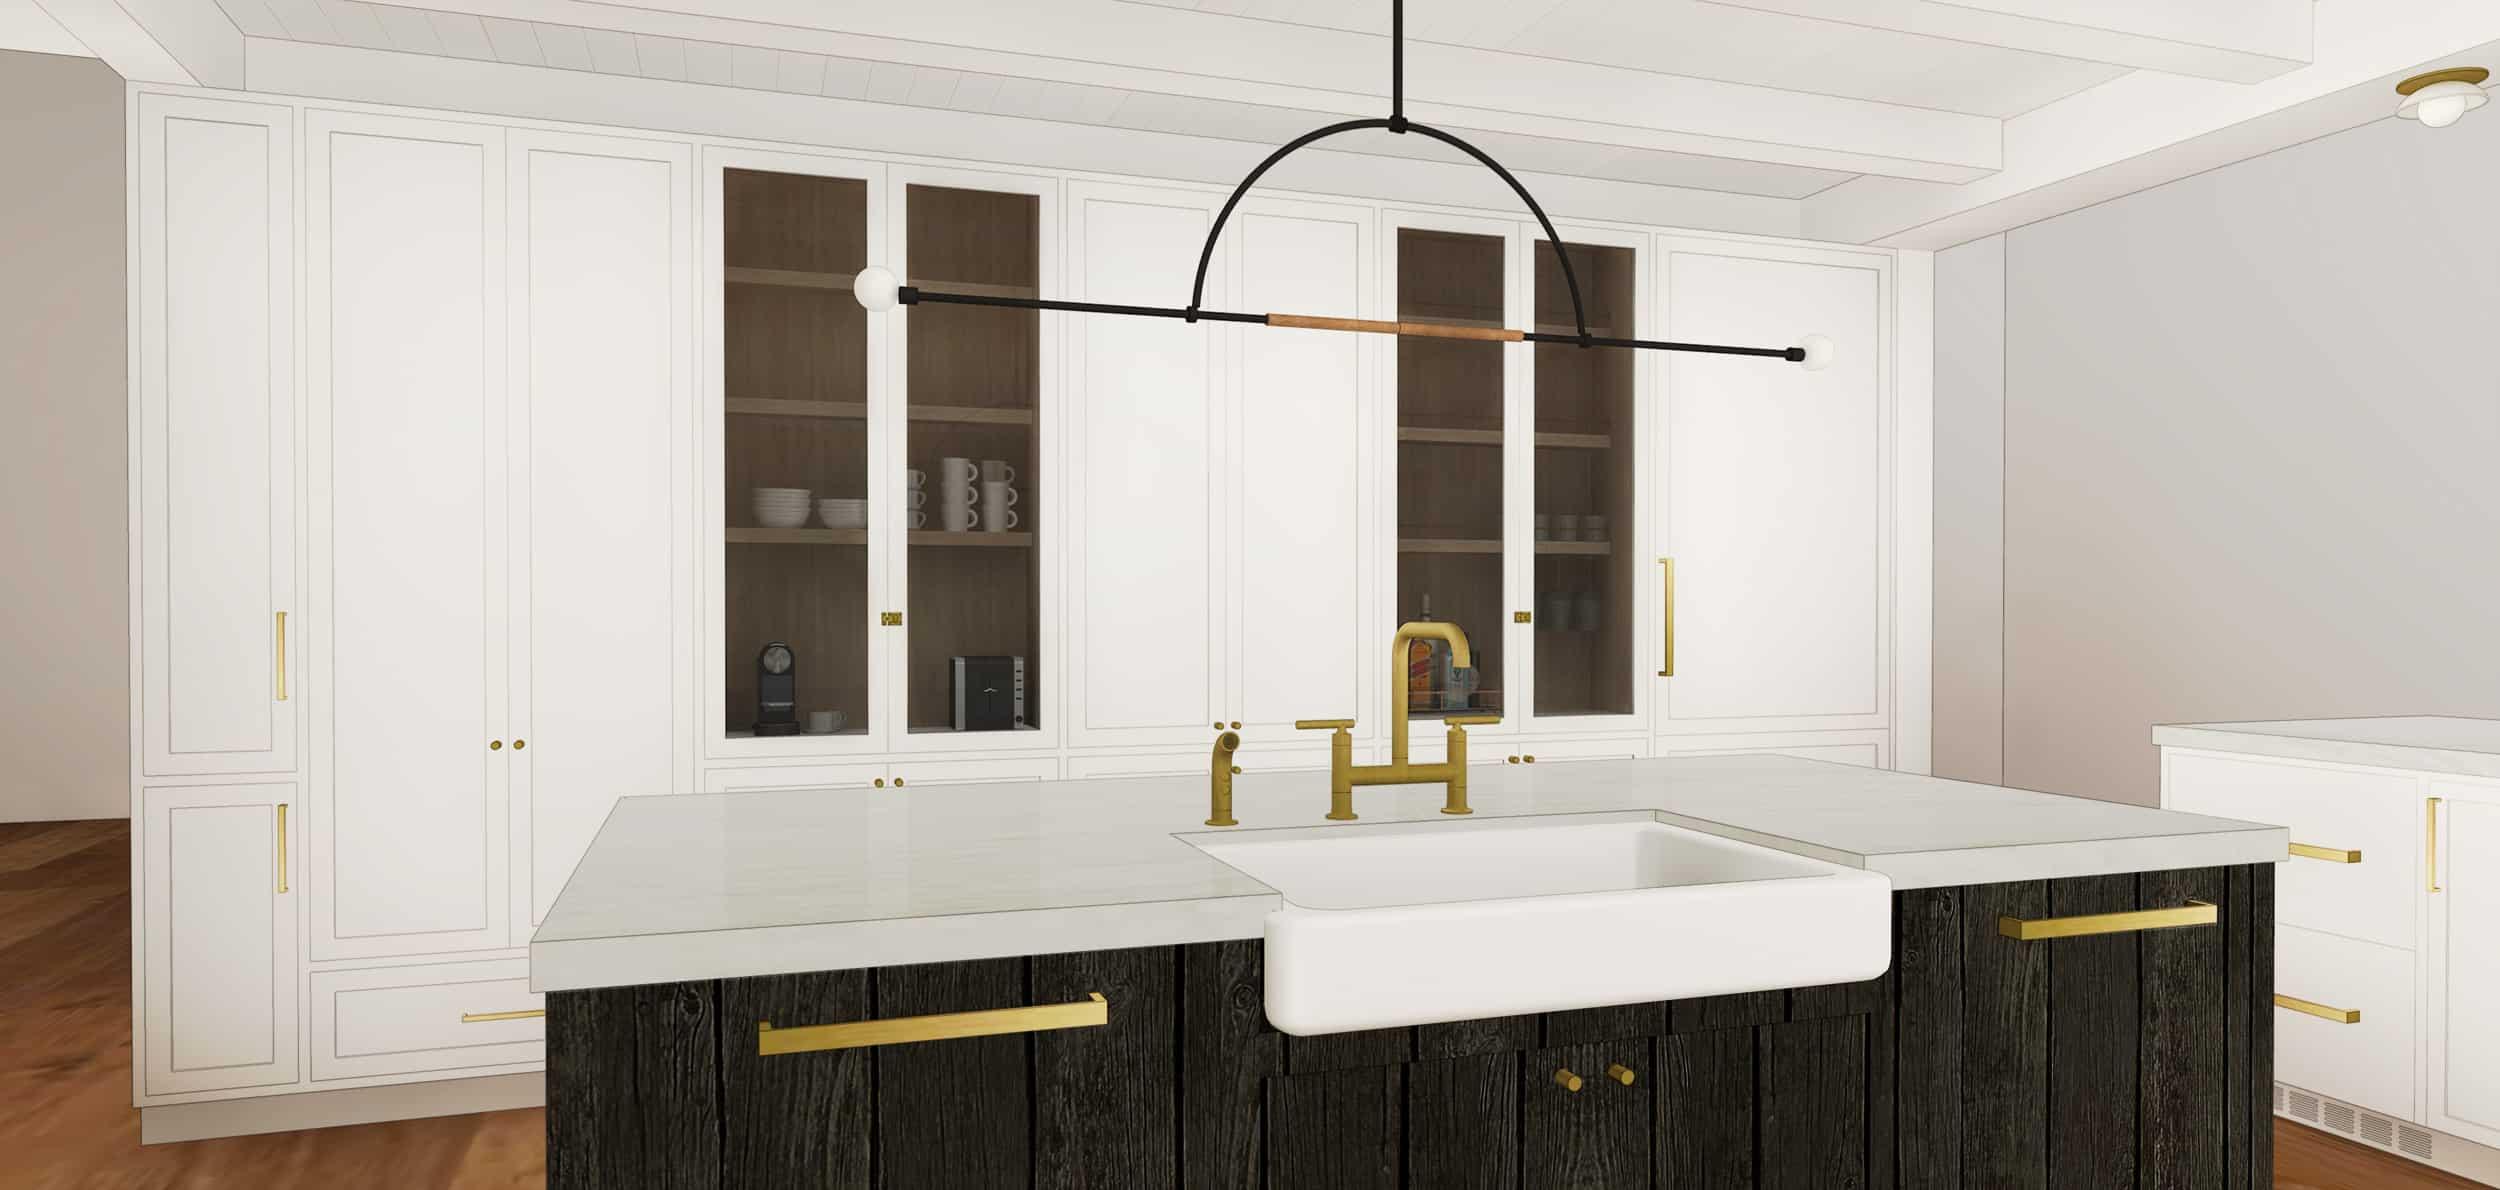 Emily Henderson Mountain House Scandinavian kitchen remodel_8